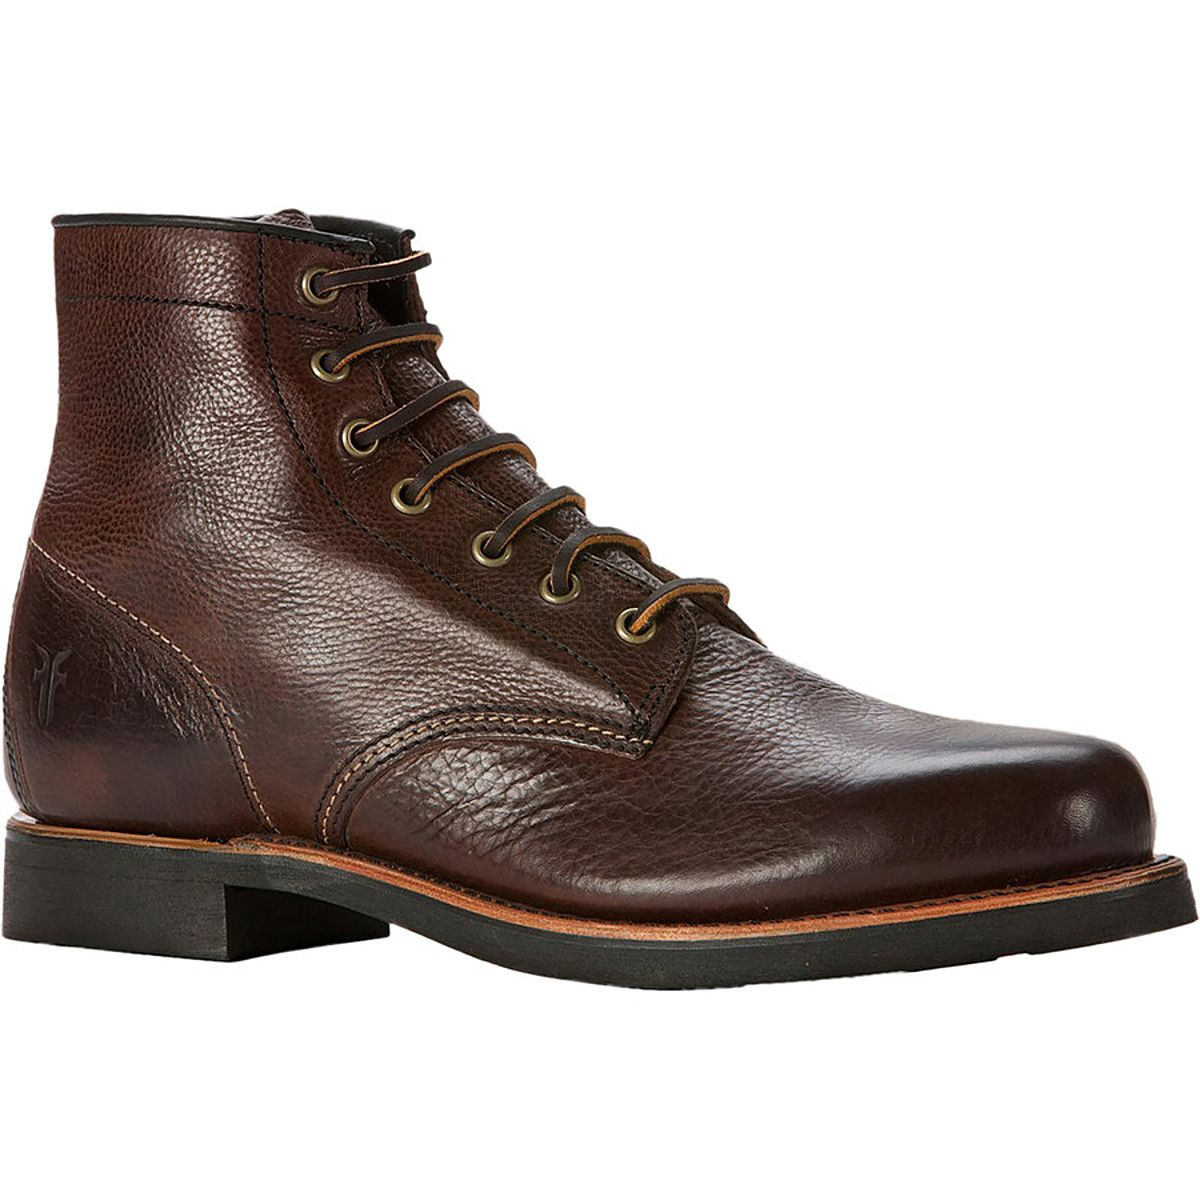 Frye Arkansas Mid Lace Boot - Men's